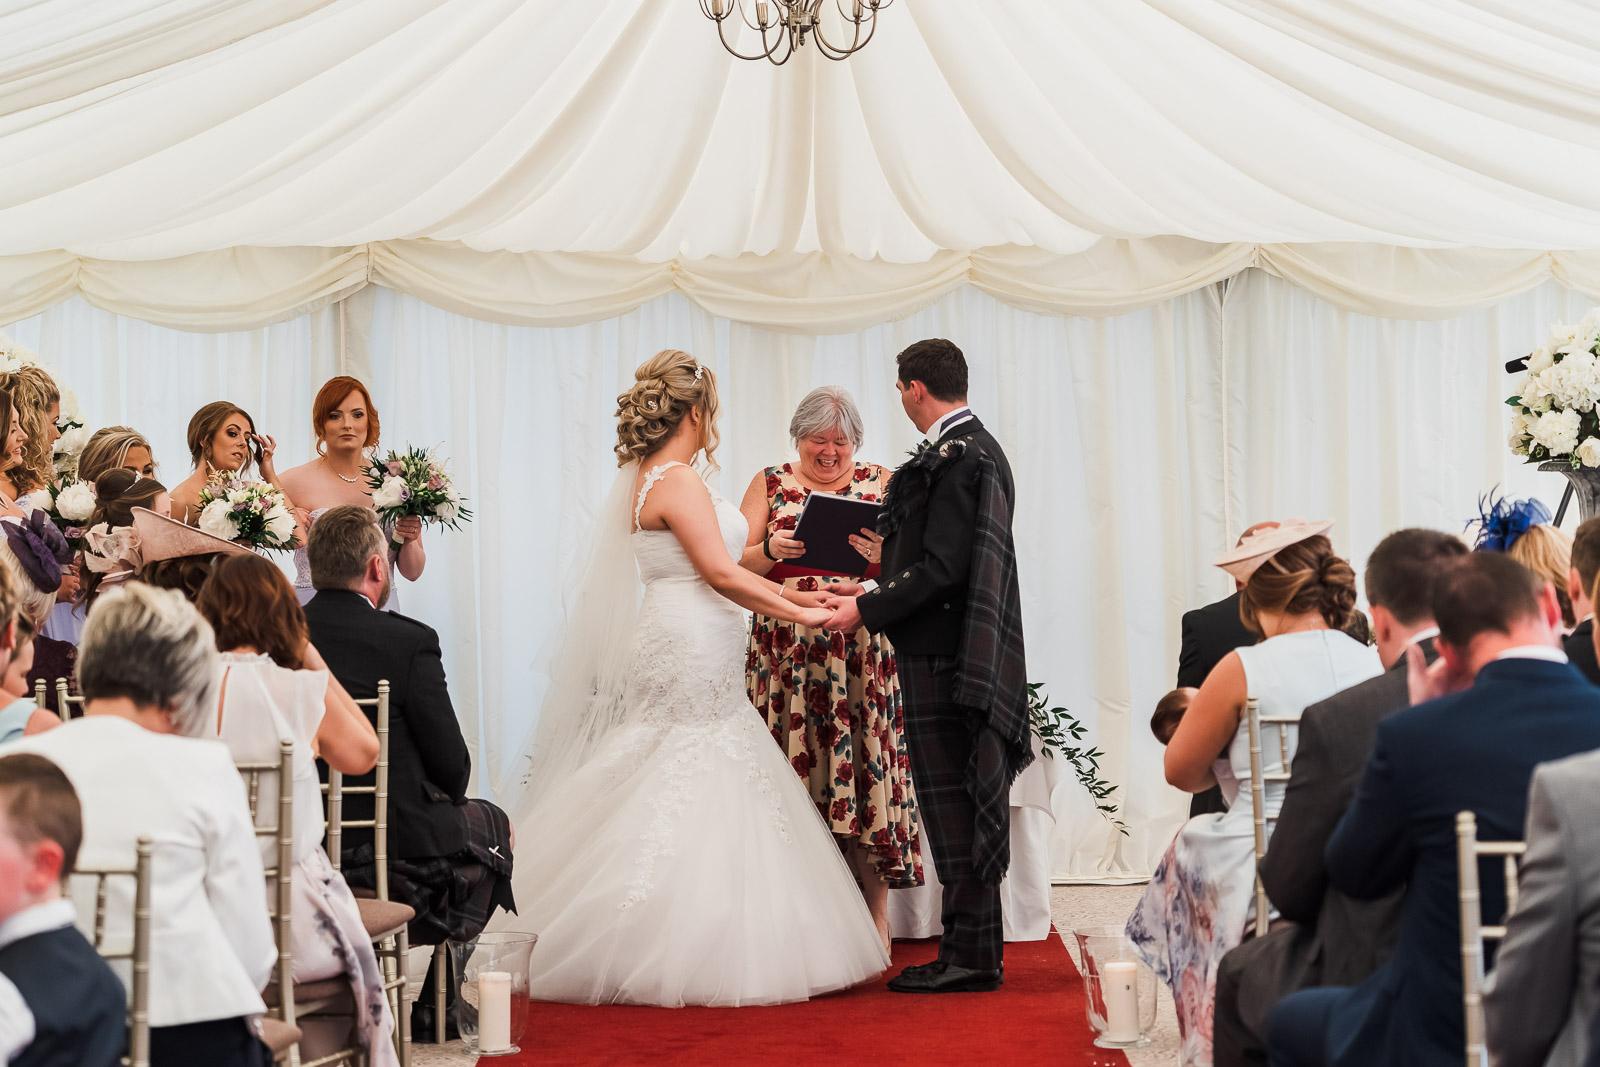 cornhill_castle_wedding_biggar_dearlyphotography (145 of 448).jpg